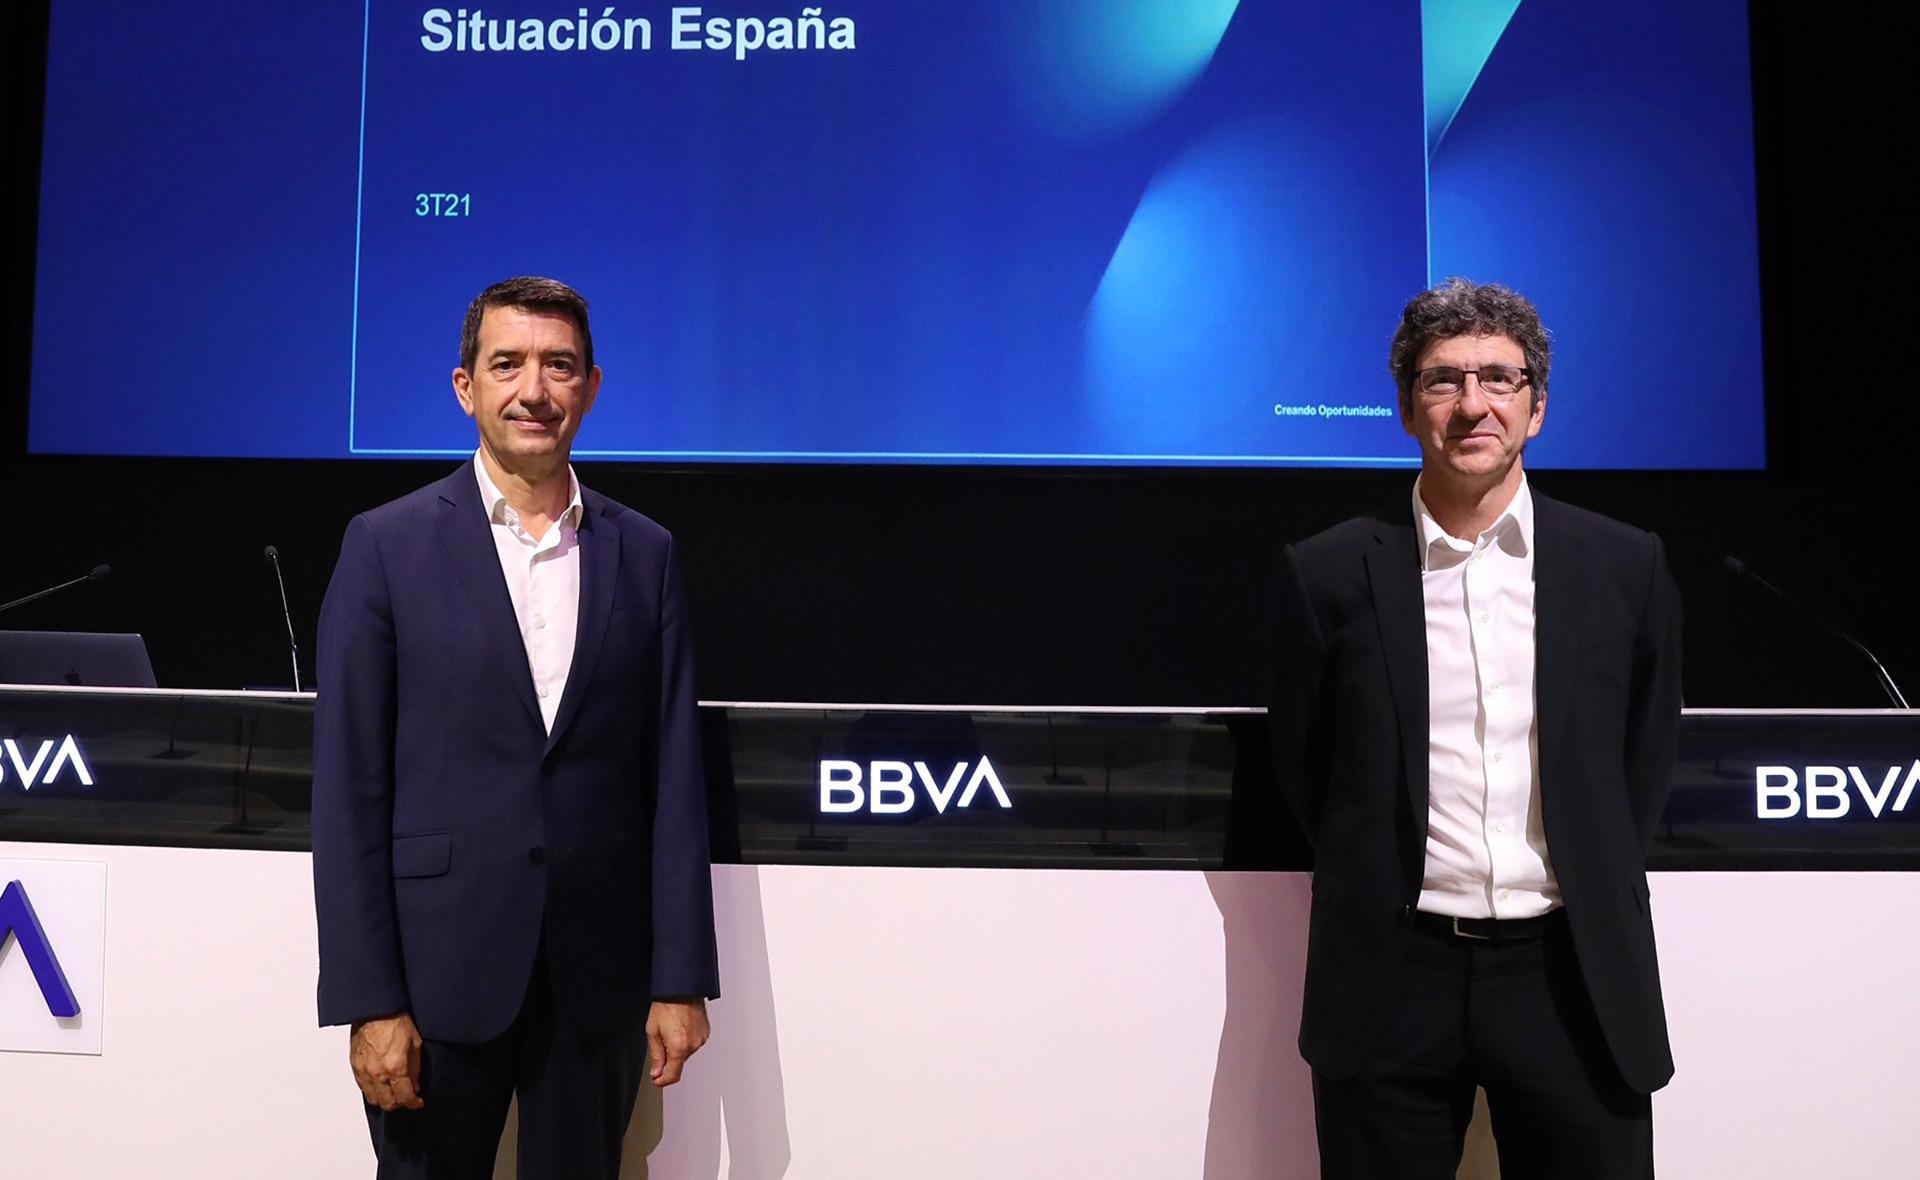 BBVA-research-situacion-españa-3T-2021_v1